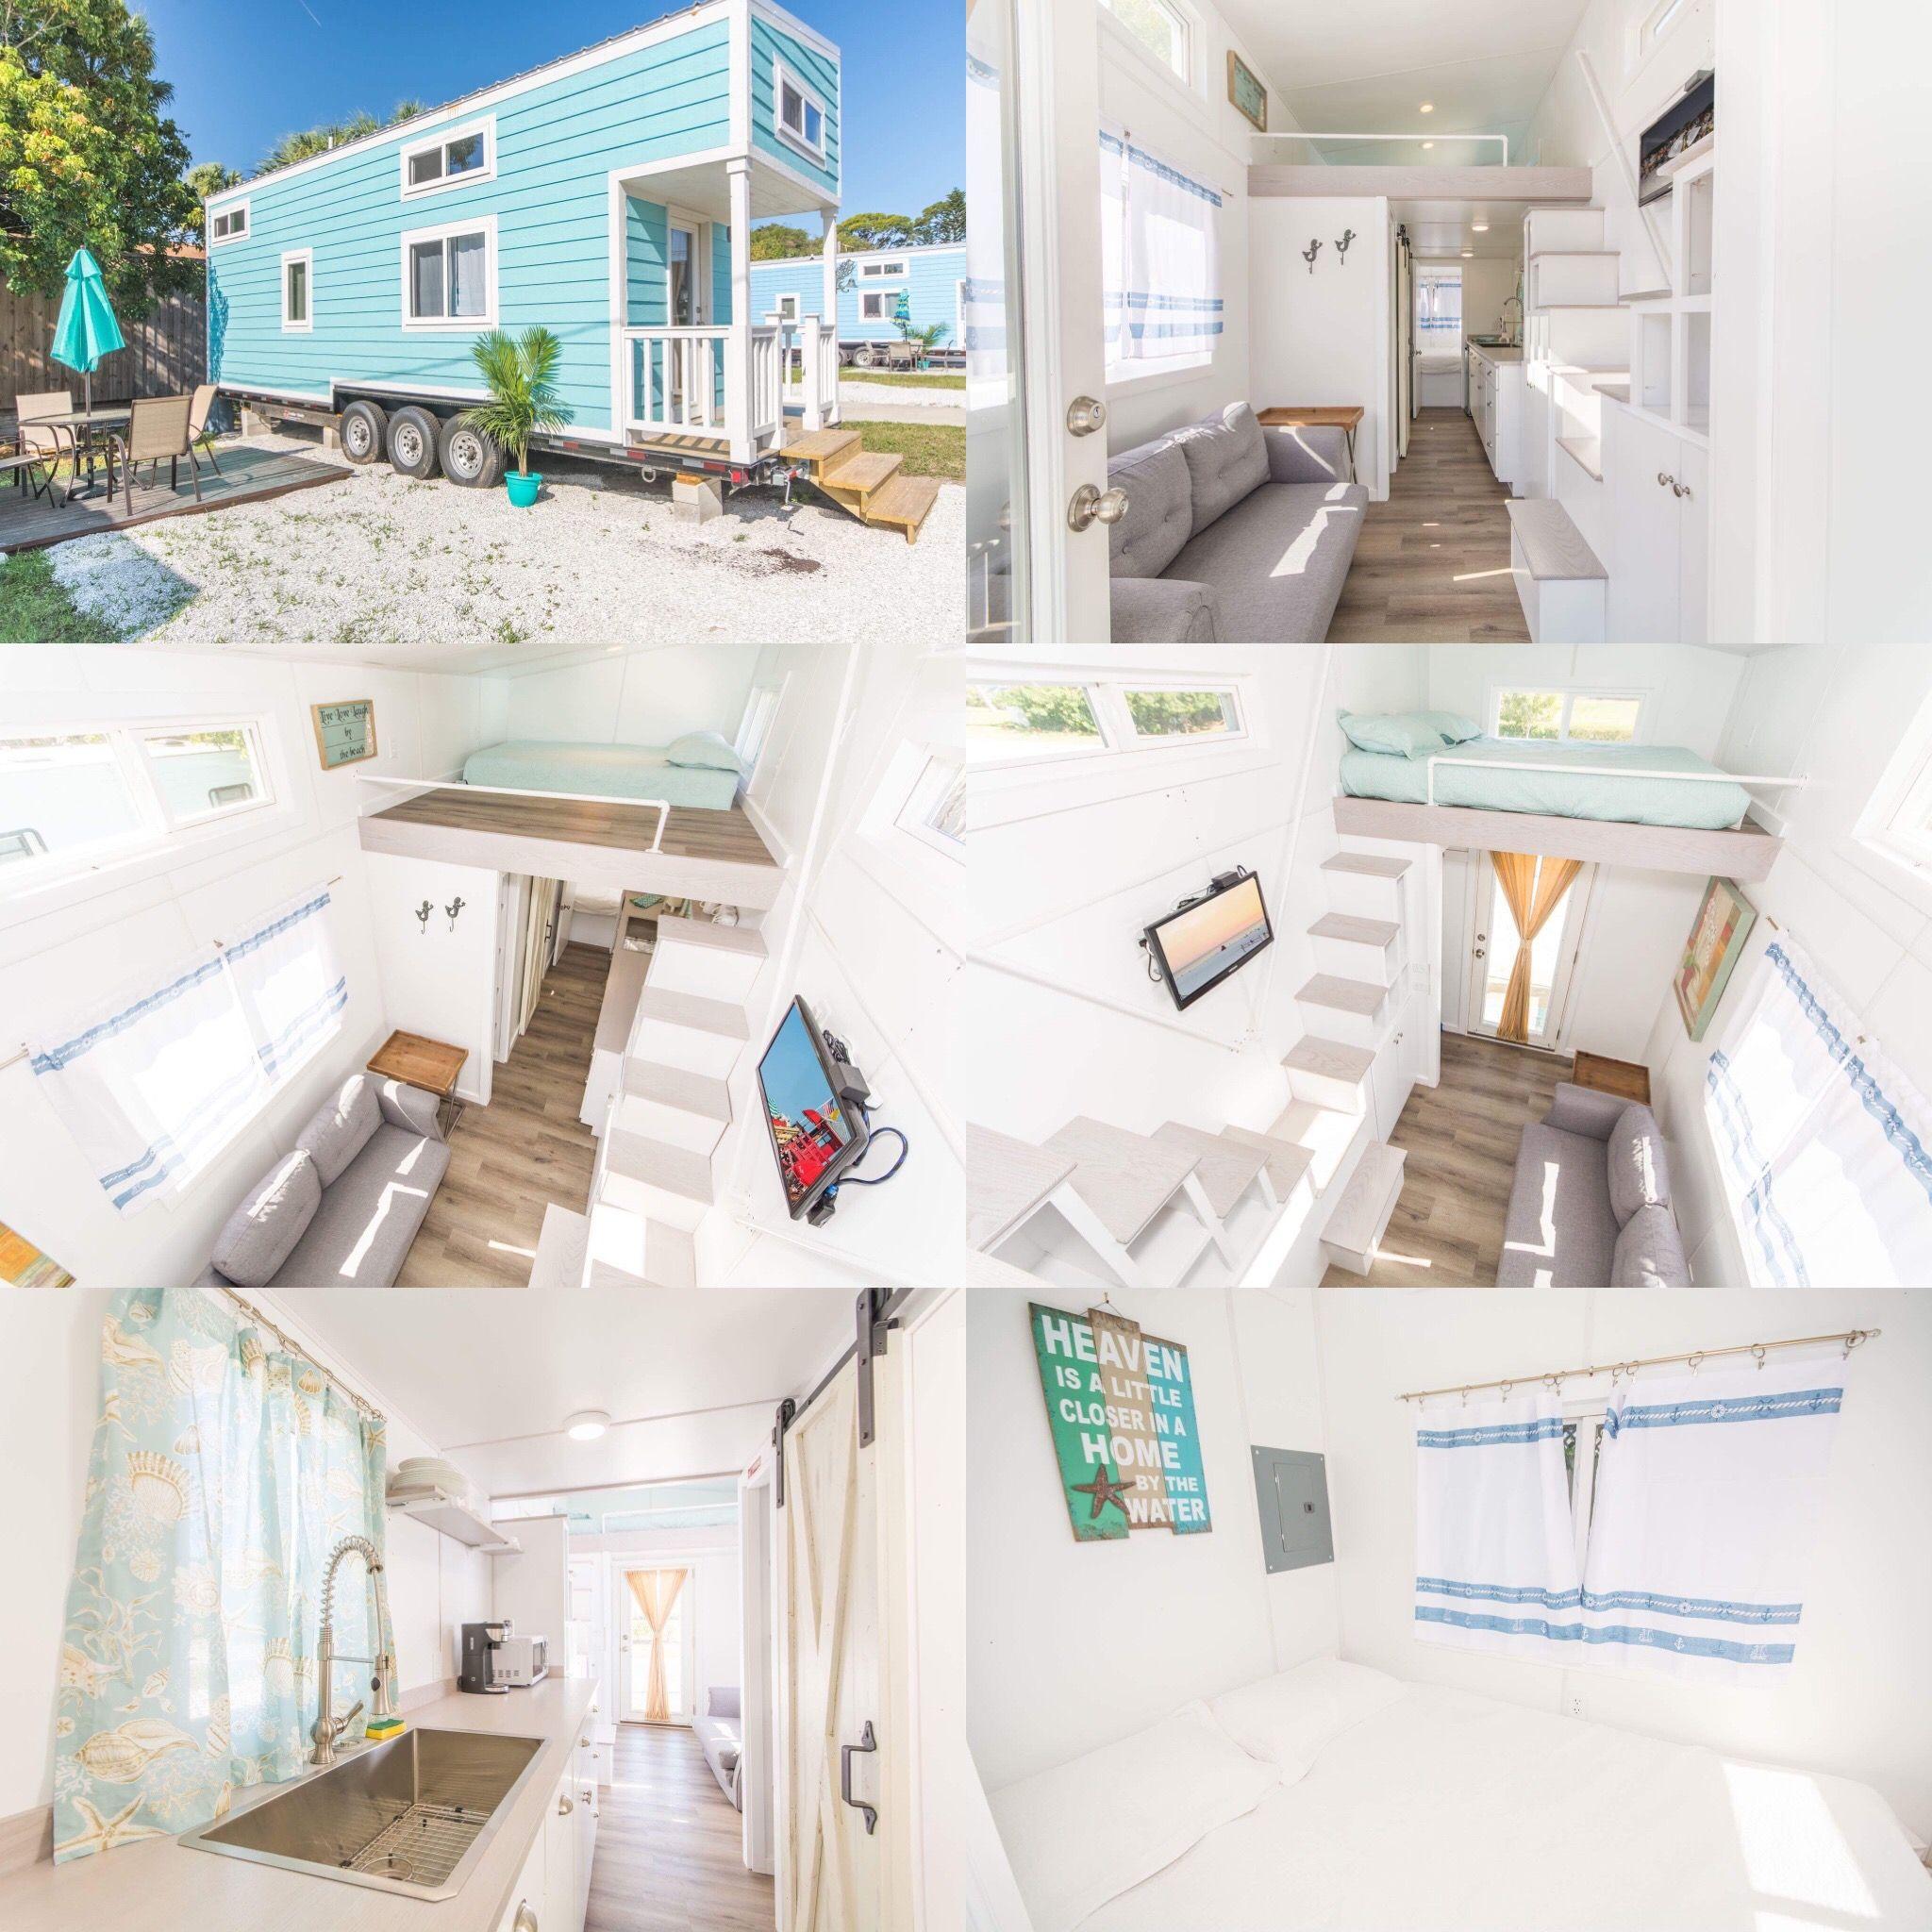 tiny houses florida. Tiny House: Aqua Oasis Houses By Siesta Key - Sarasota, FL Take A Florida